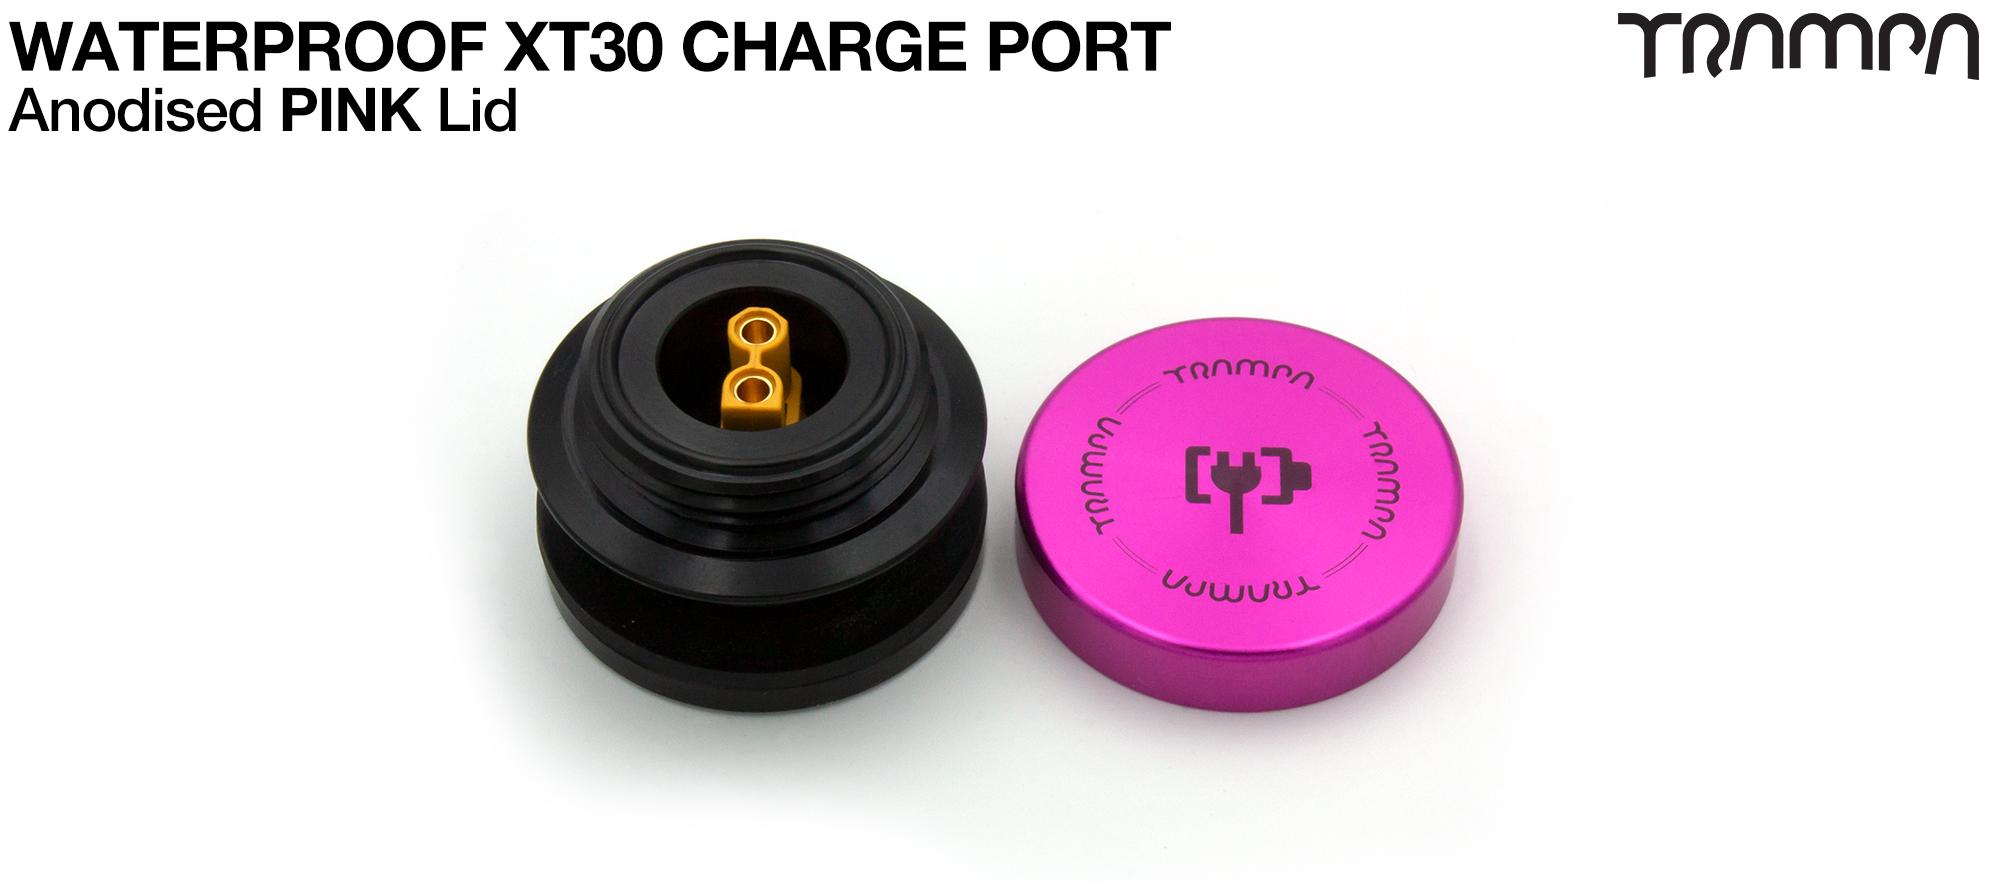 ORRSOM GT XT30 WATERPROOF Charge Port - PINK